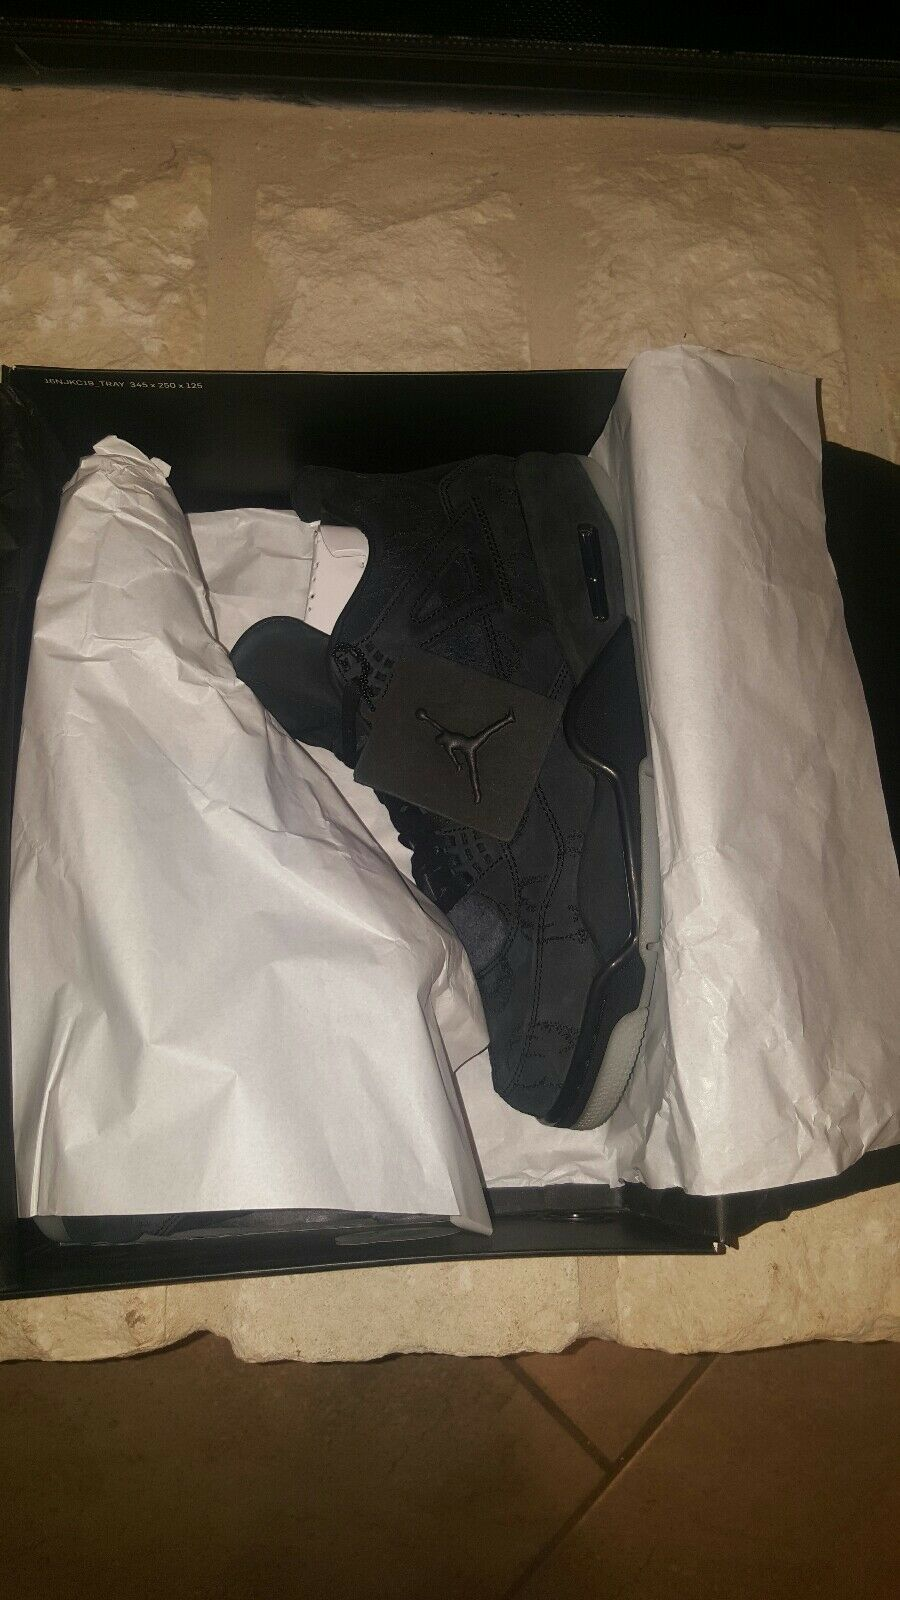 Kaws x Nike Air Jordan 4 retro negro comodo barato barato comodo y hermoso moda bbf676